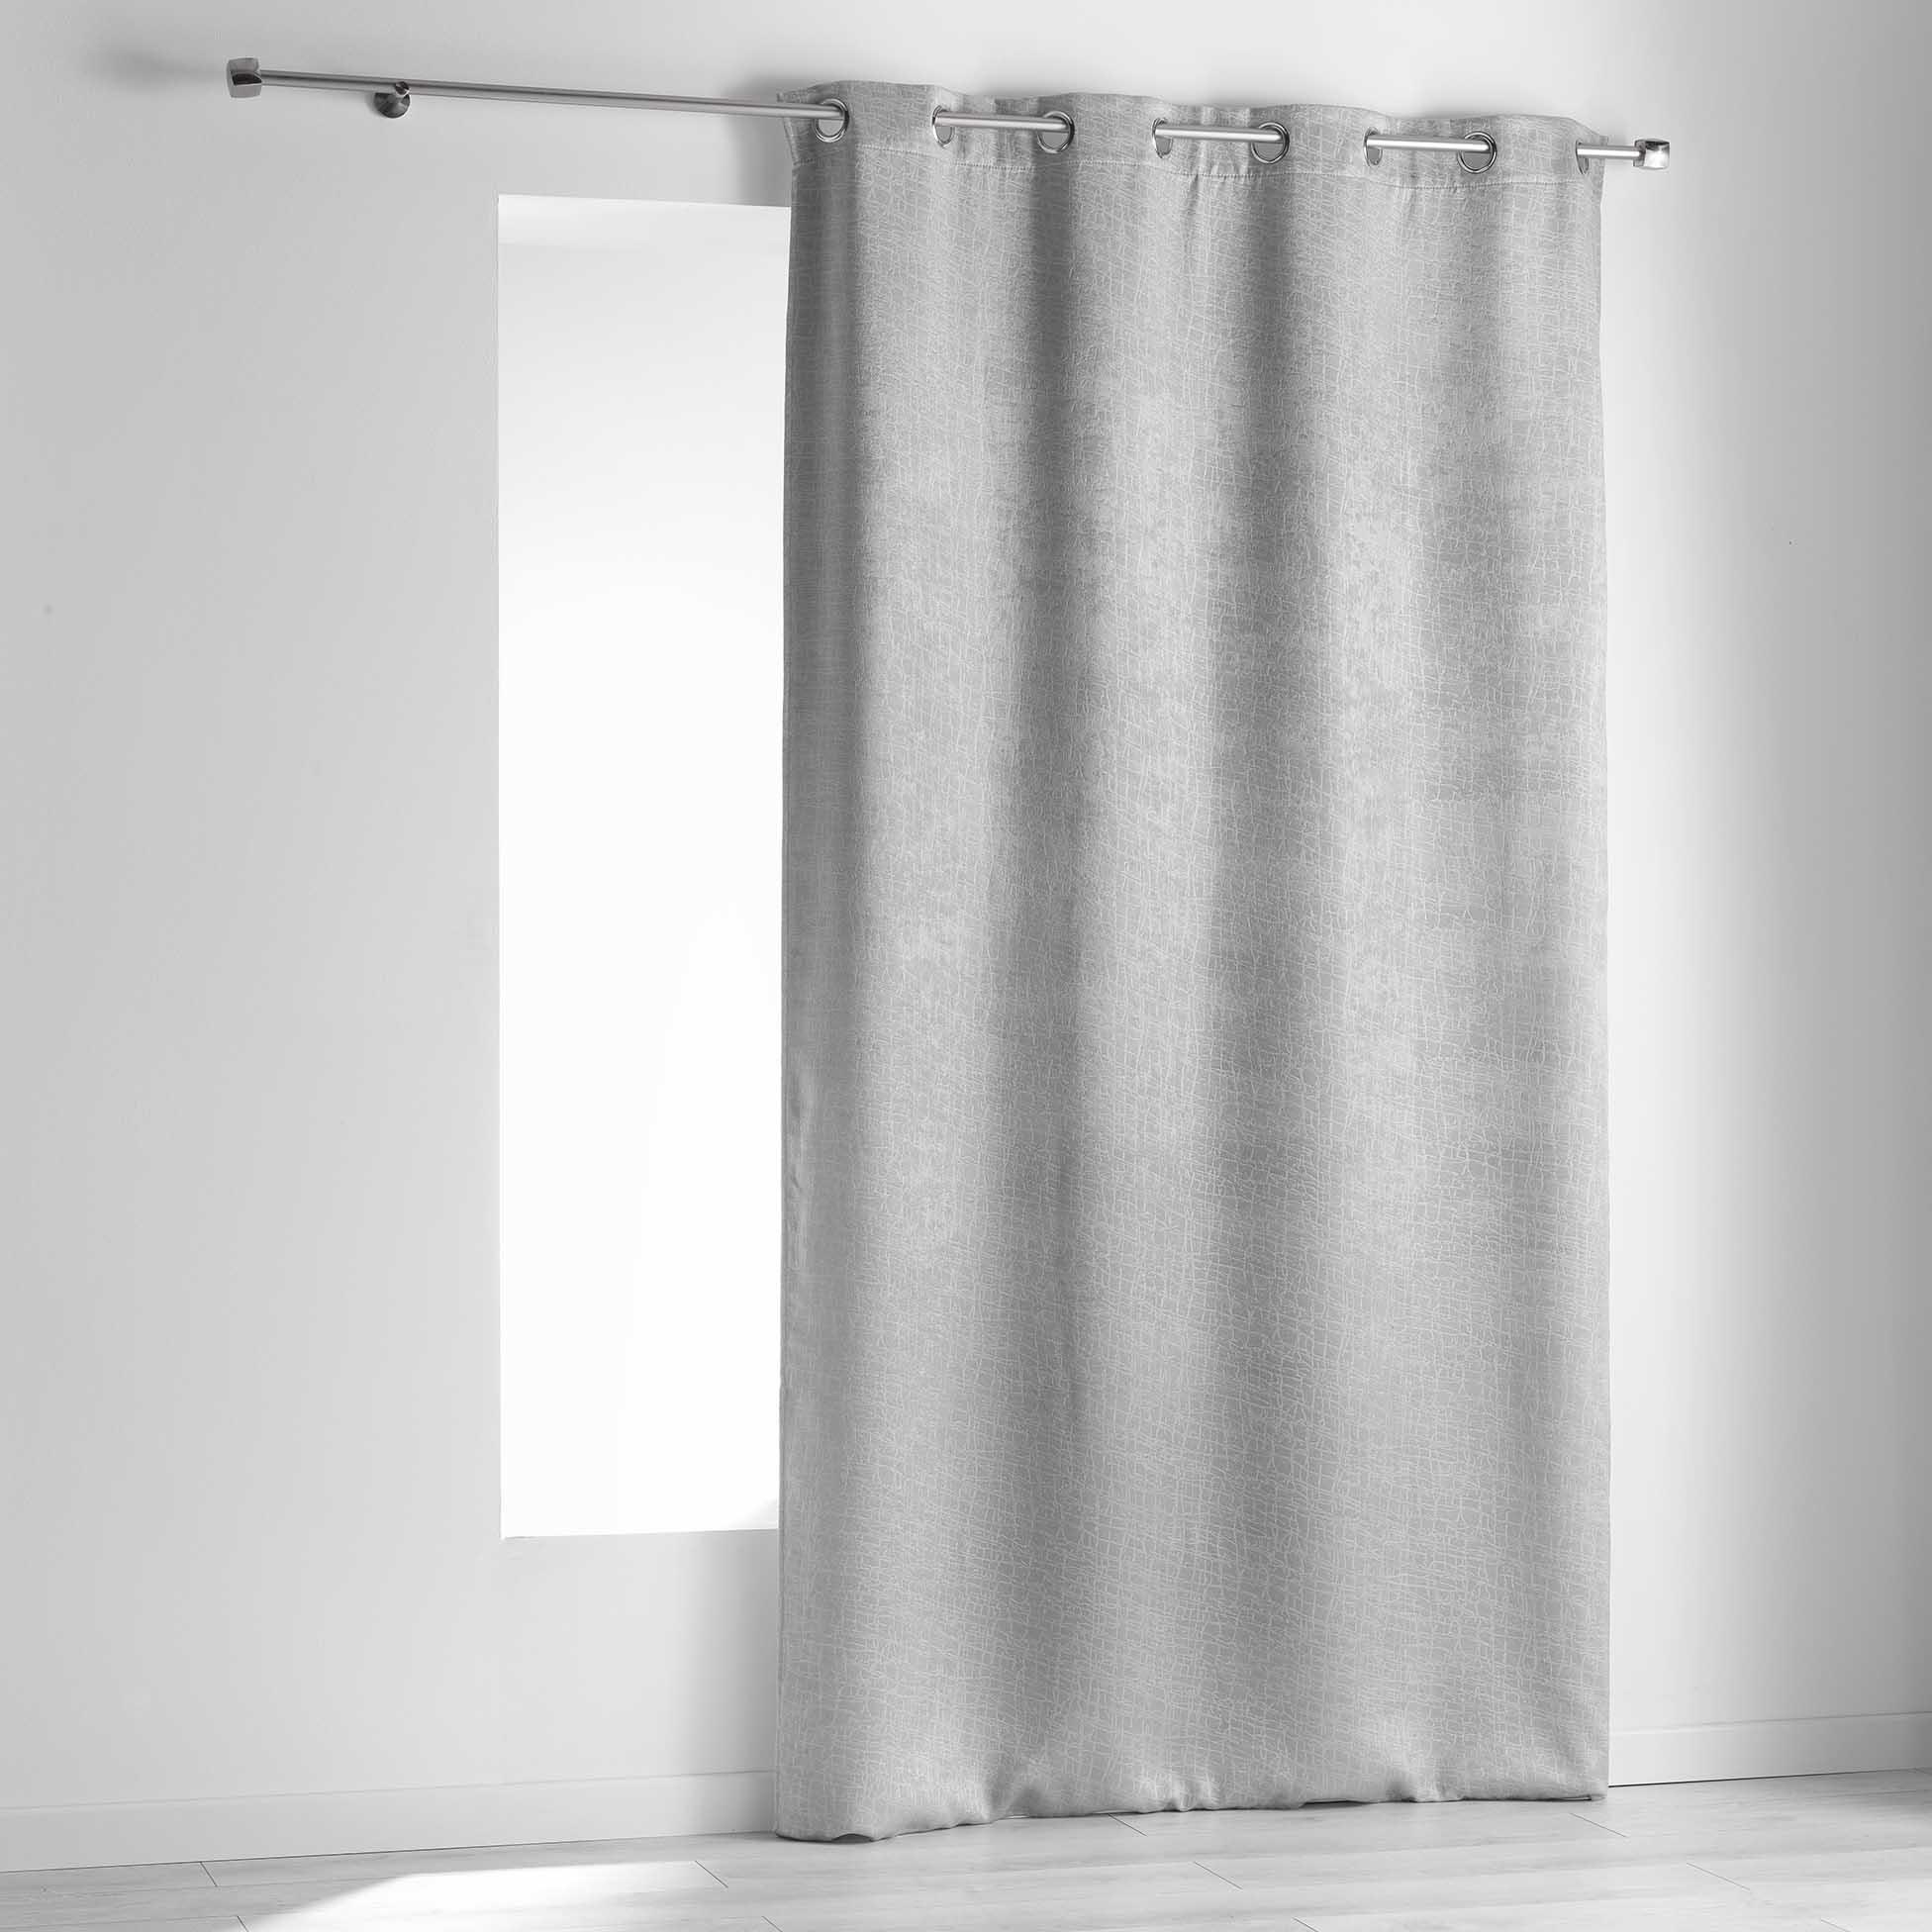 eminza rideaux occultants free eminza rideau occultant x h cm metallia gris with eminza rideaux. Black Bedroom Furniture Sets. Home Design Ideas